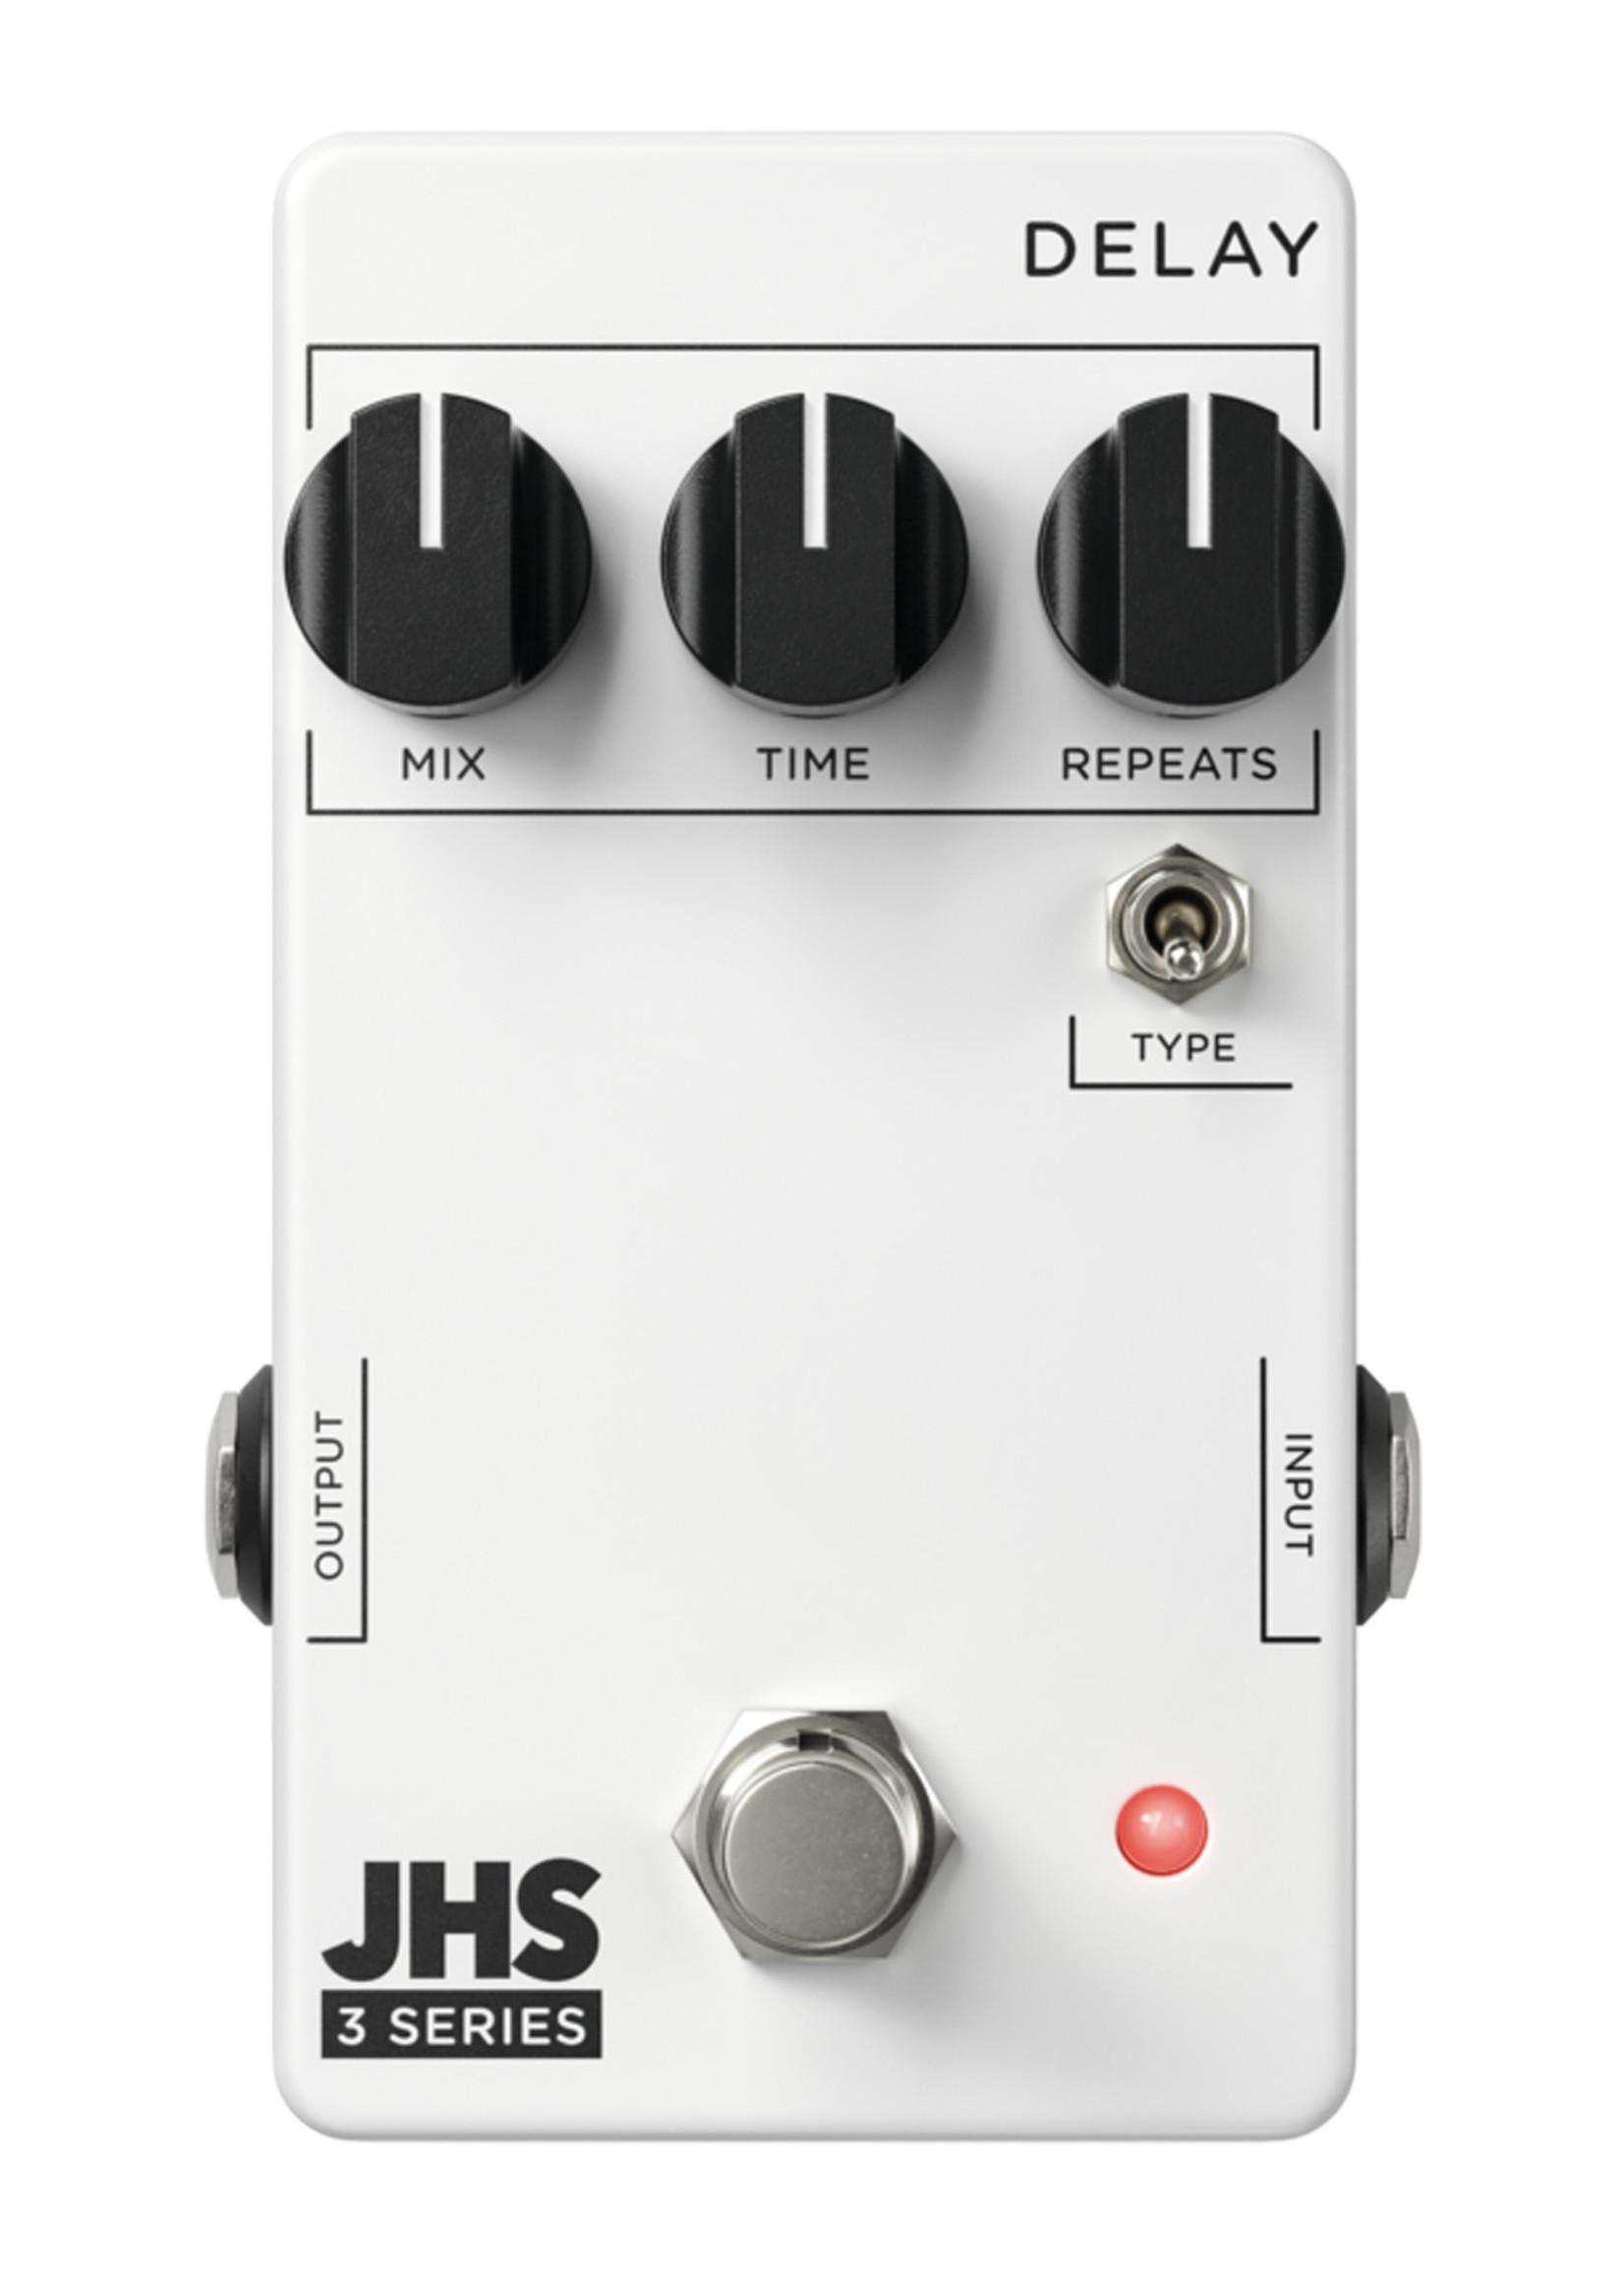 JHS JHS 3 Series Delay